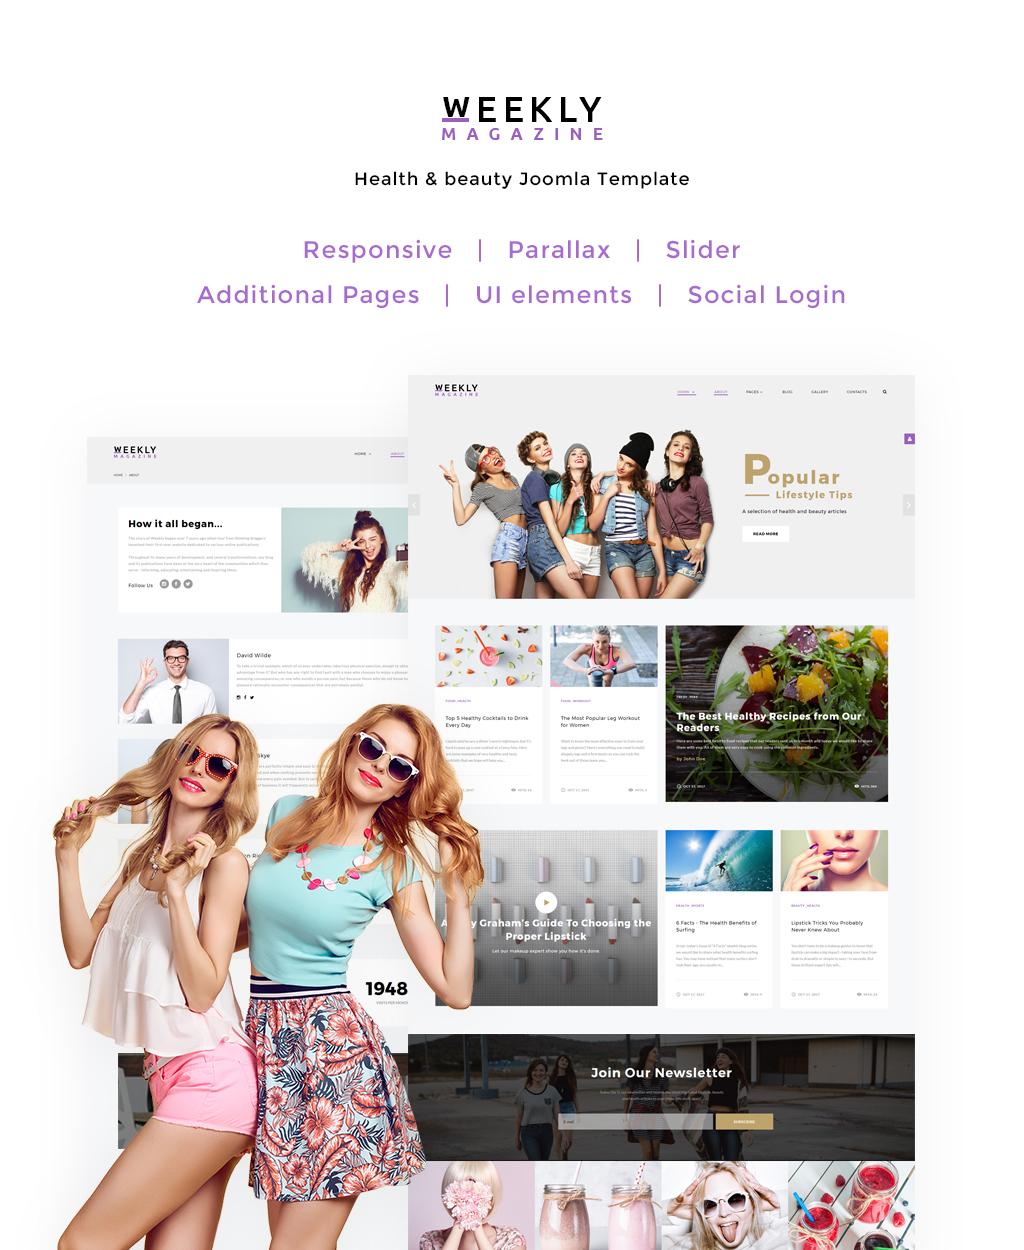 """Weekly Magazine - Health & Beauty"" - адаптивний Joomla шаблон №65713 - скріншот"